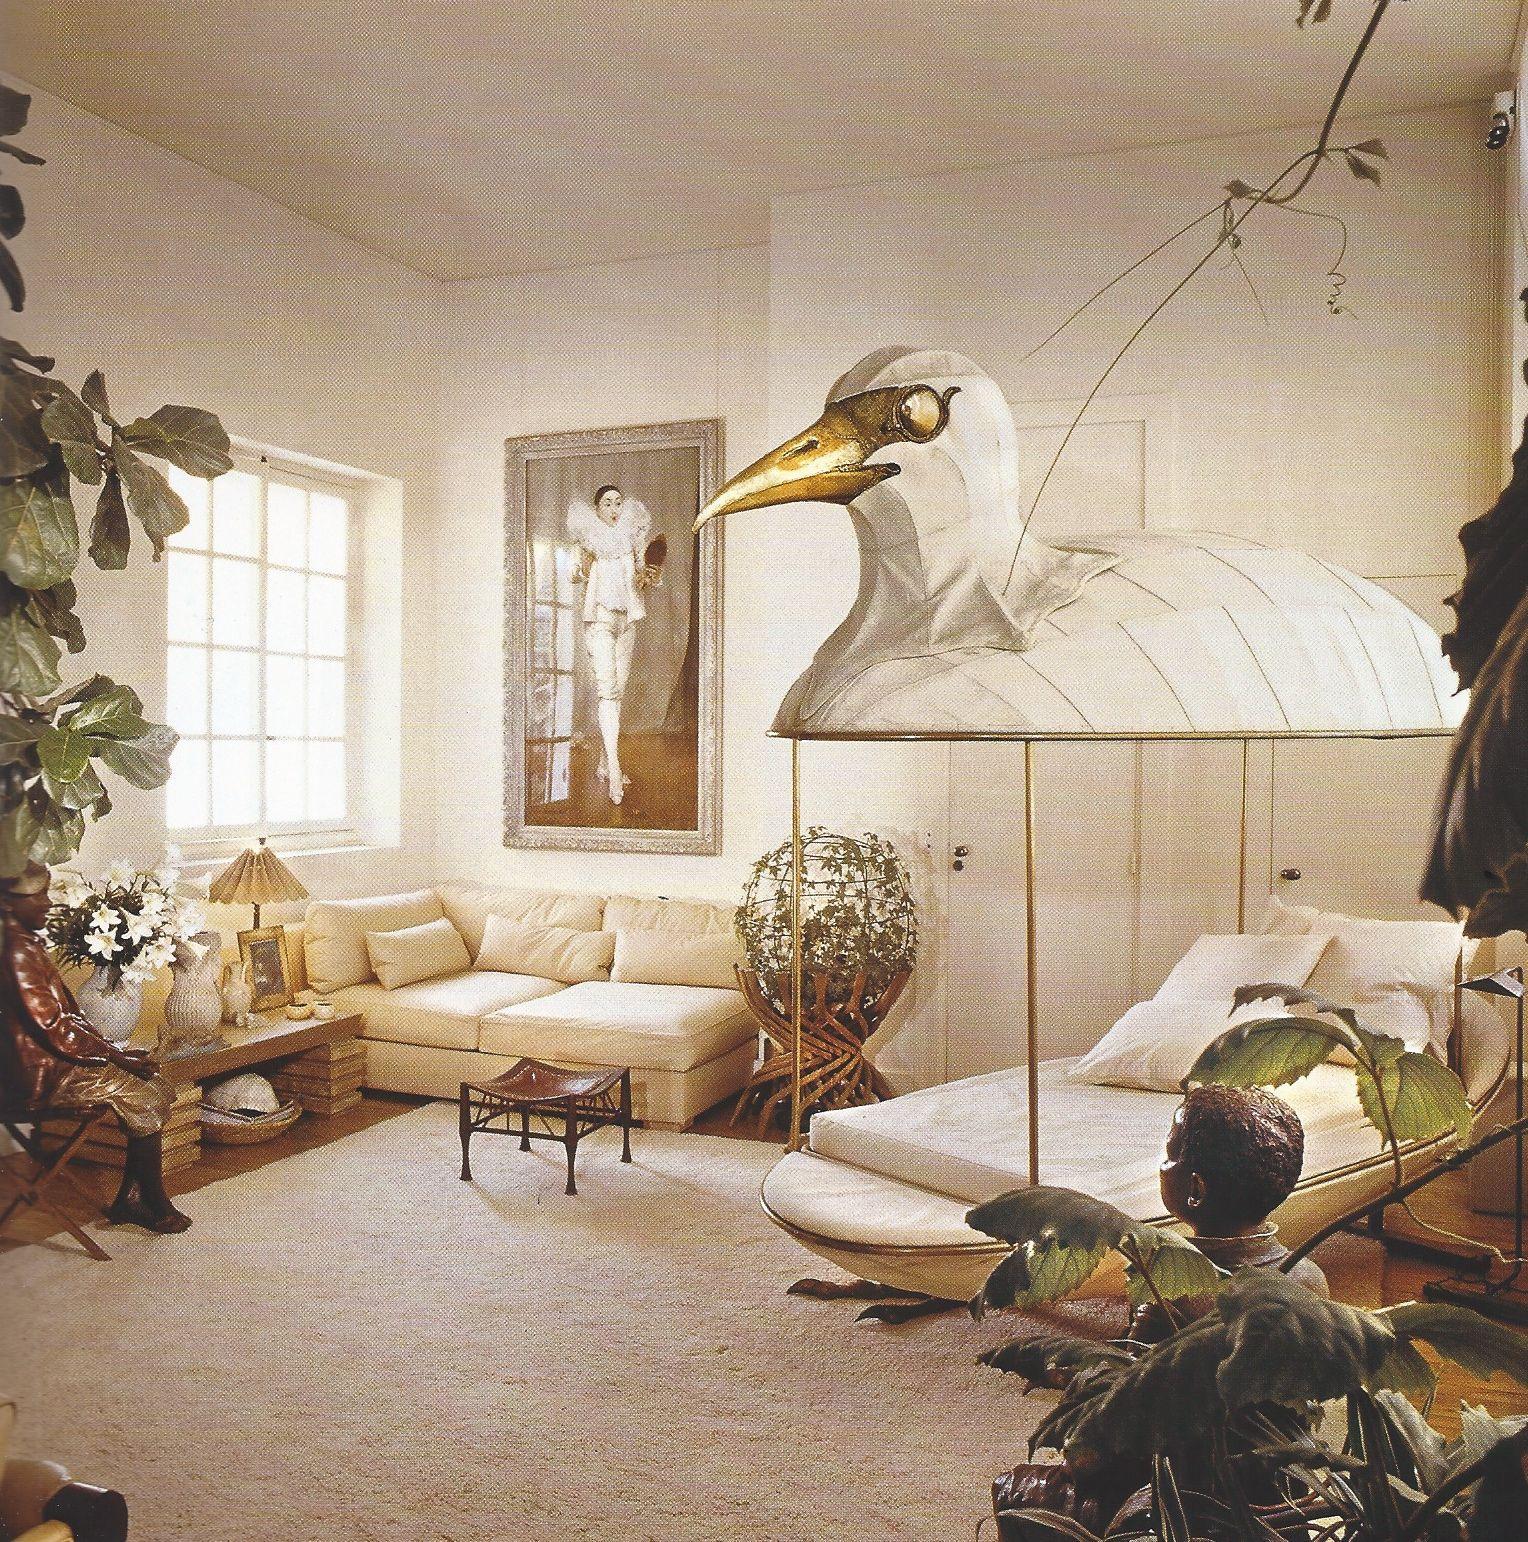 Jacques Grange 39 S Apartment In Paris 1975 Bedrooms Pinterest Pillow Room That 39 S Weird